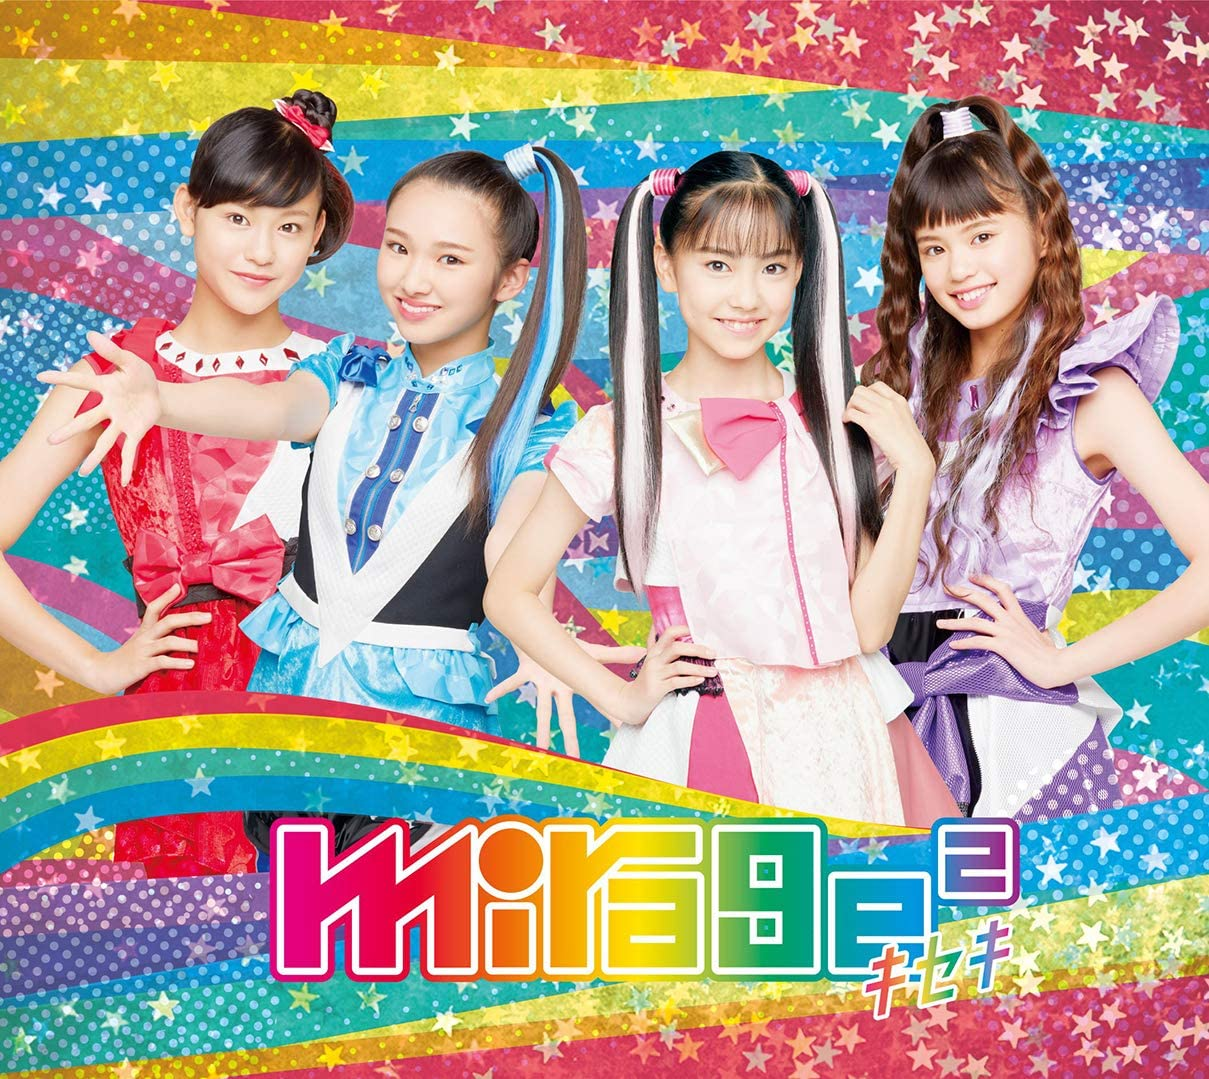 mirage2「キセキ (初回生産限定盤) (DVD付) (デカジャケット付) 」